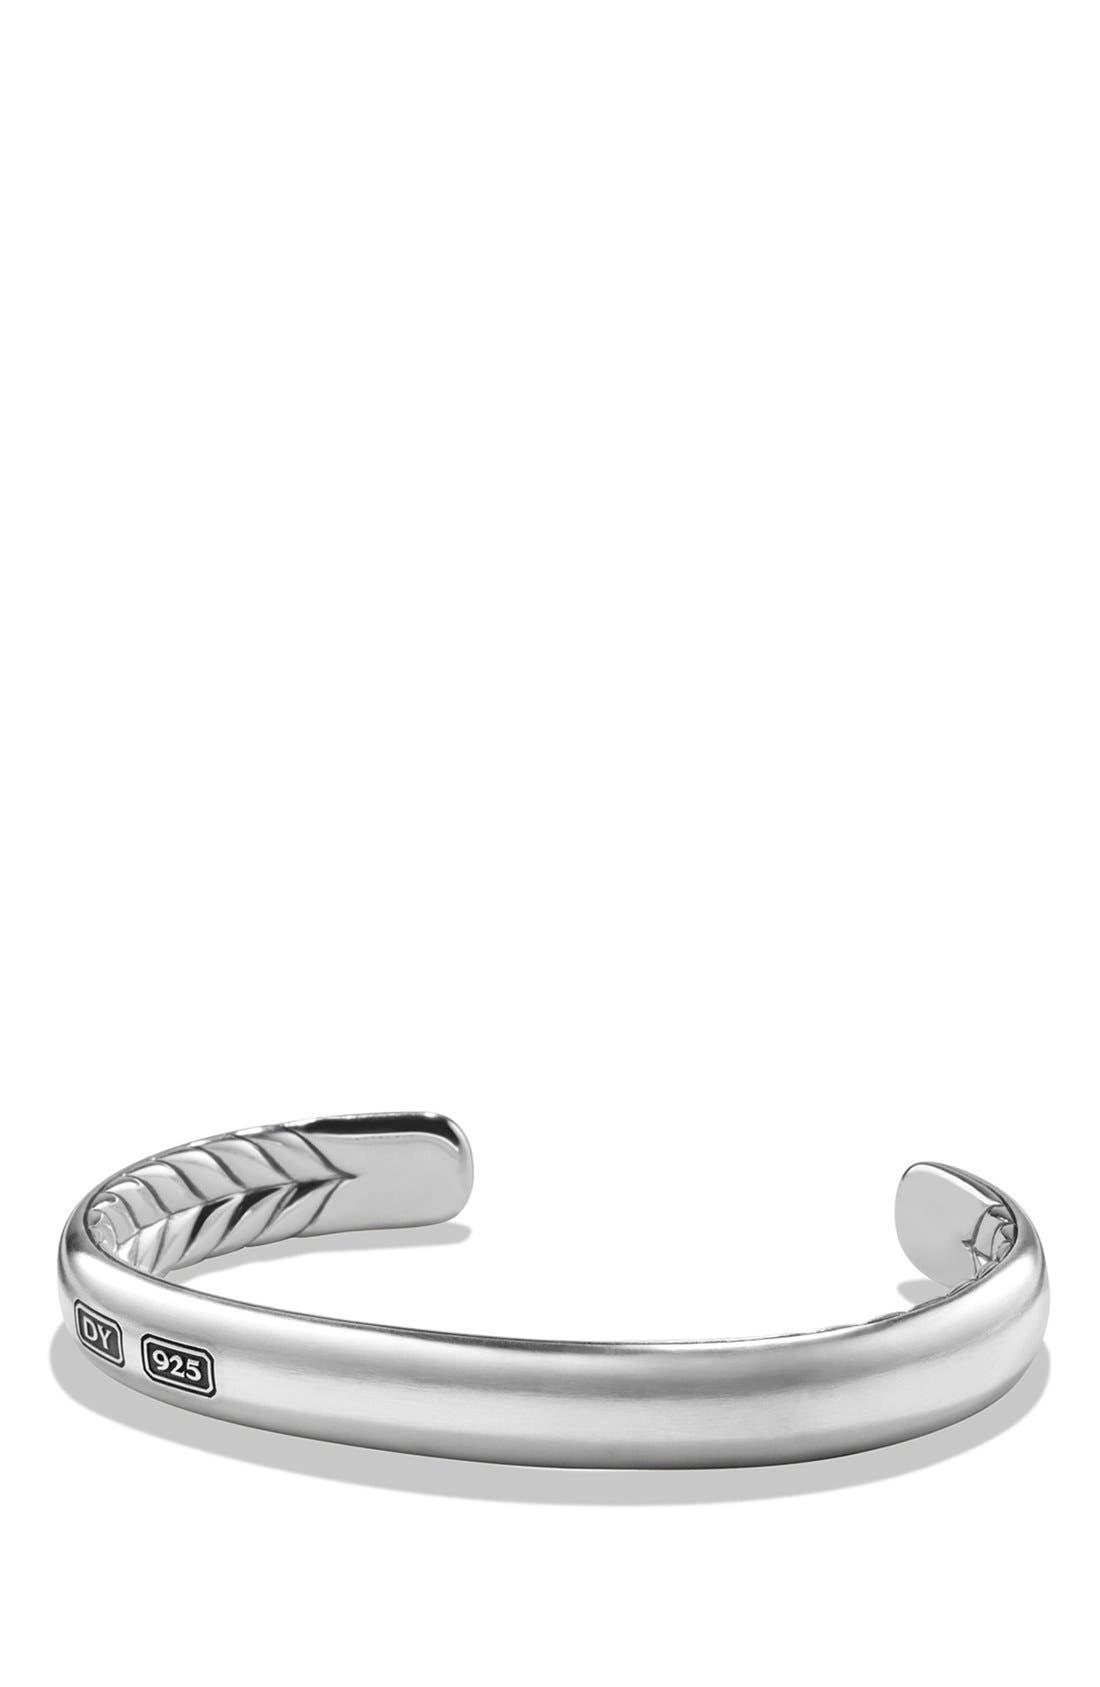 Alternate Image 1 Selected - David Yurman 'Streamline' Cuff Bracelet